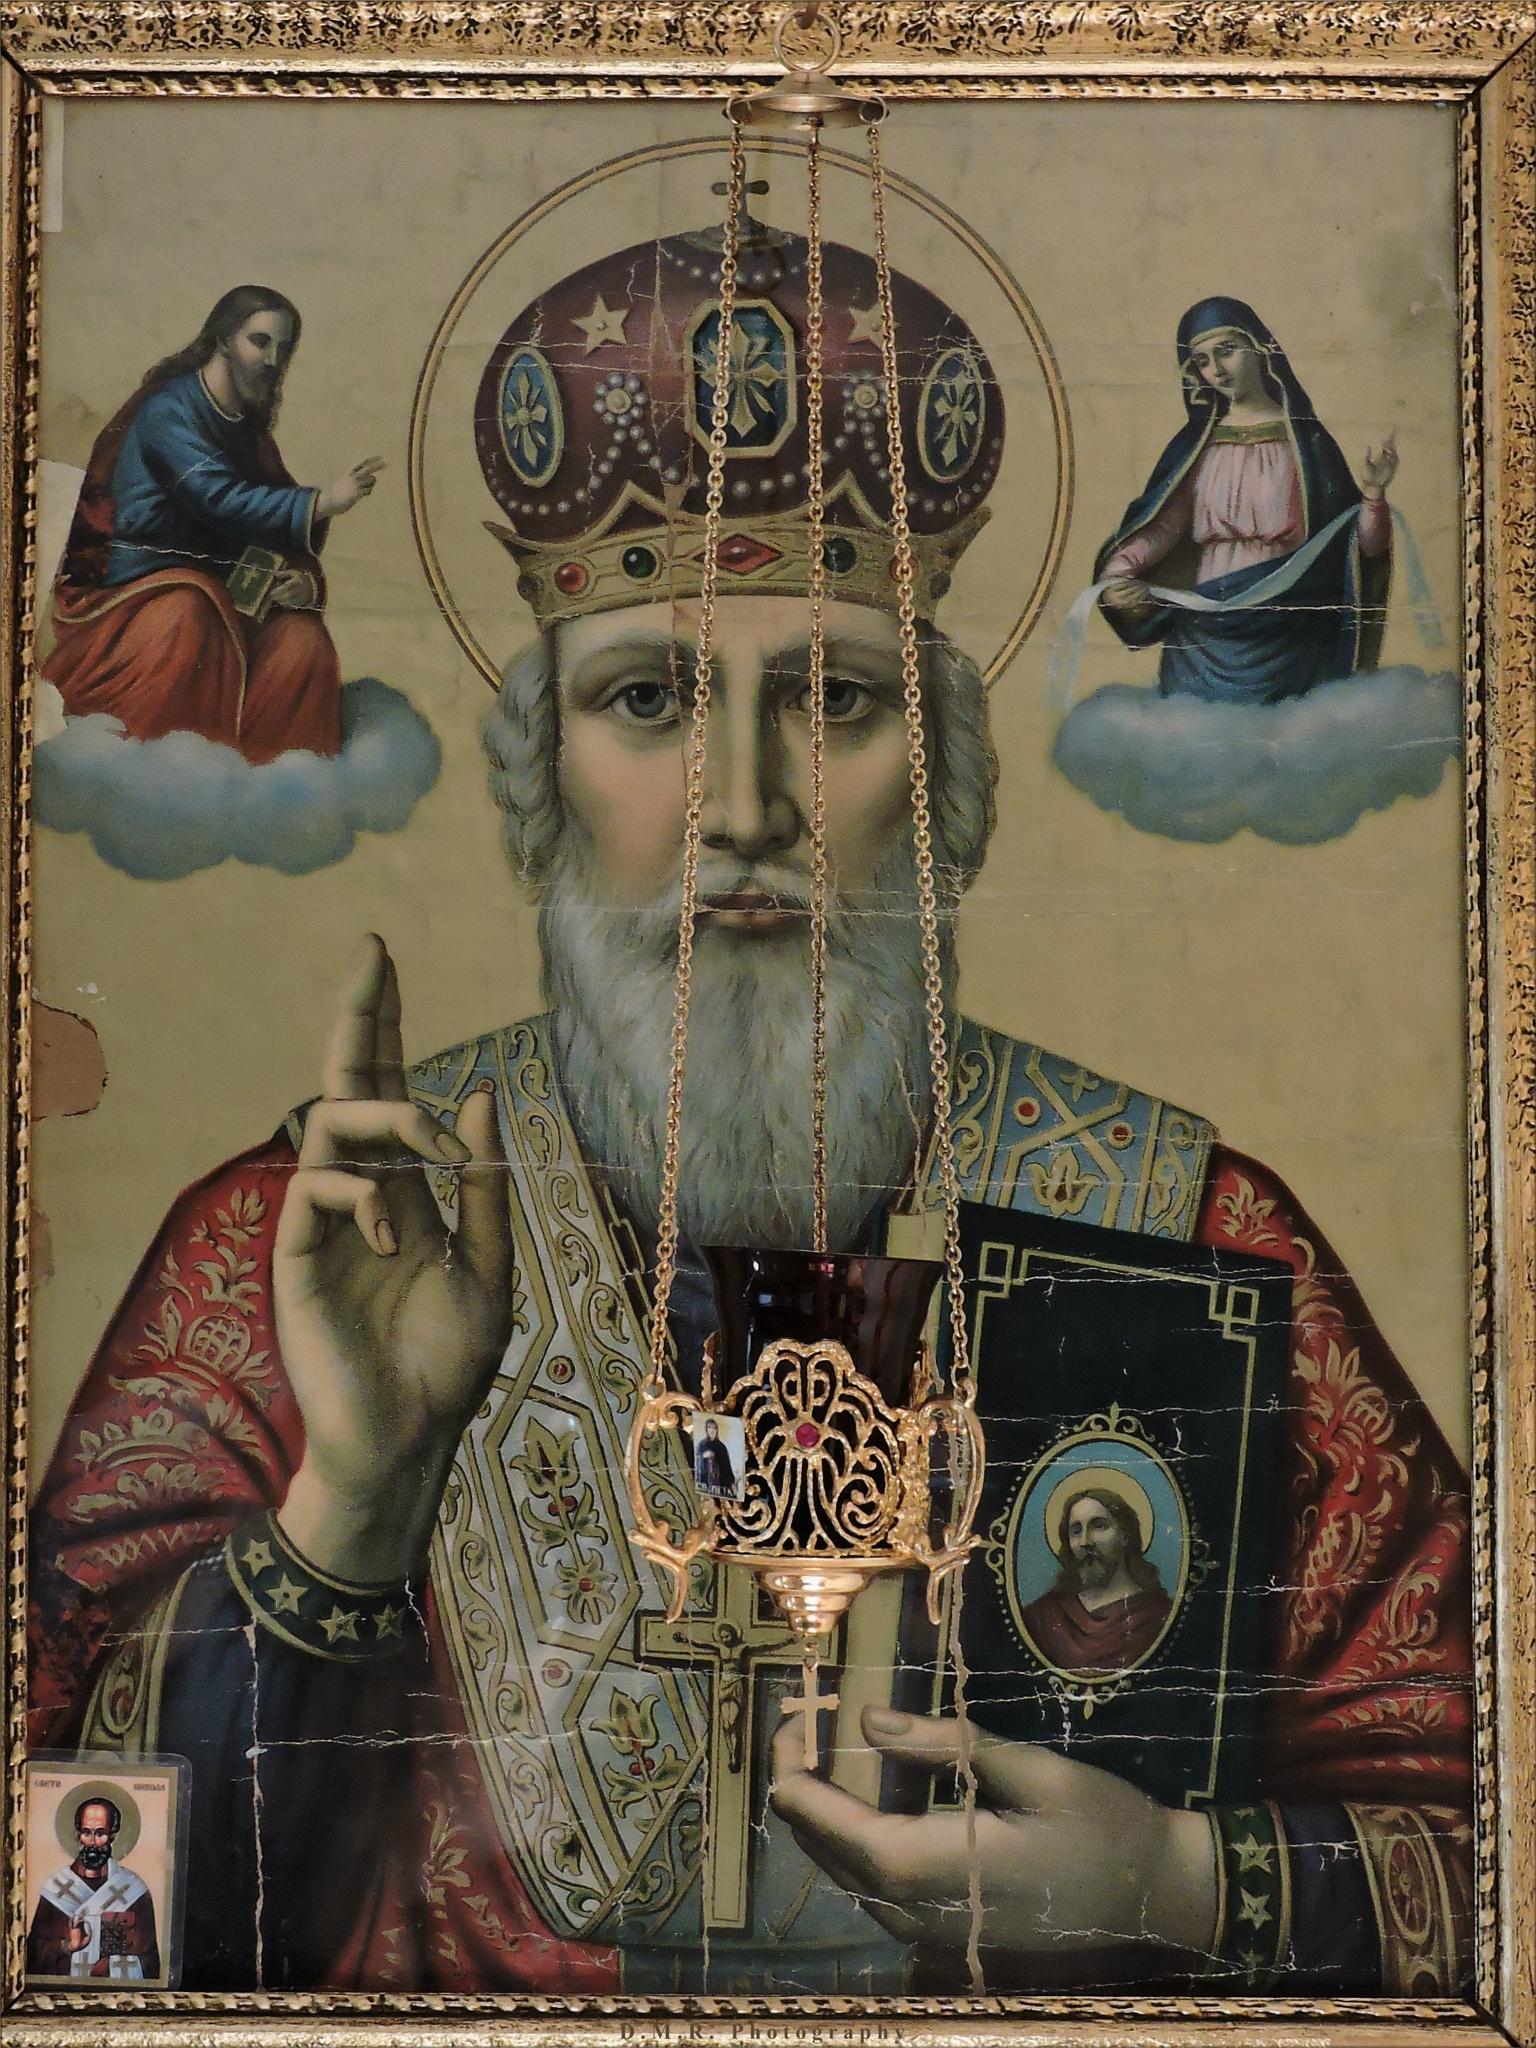 Icon of St. Nicholas from 1939, printed in Ljubljana Serbian Orthodox eparchy by Драгана М. Реџић